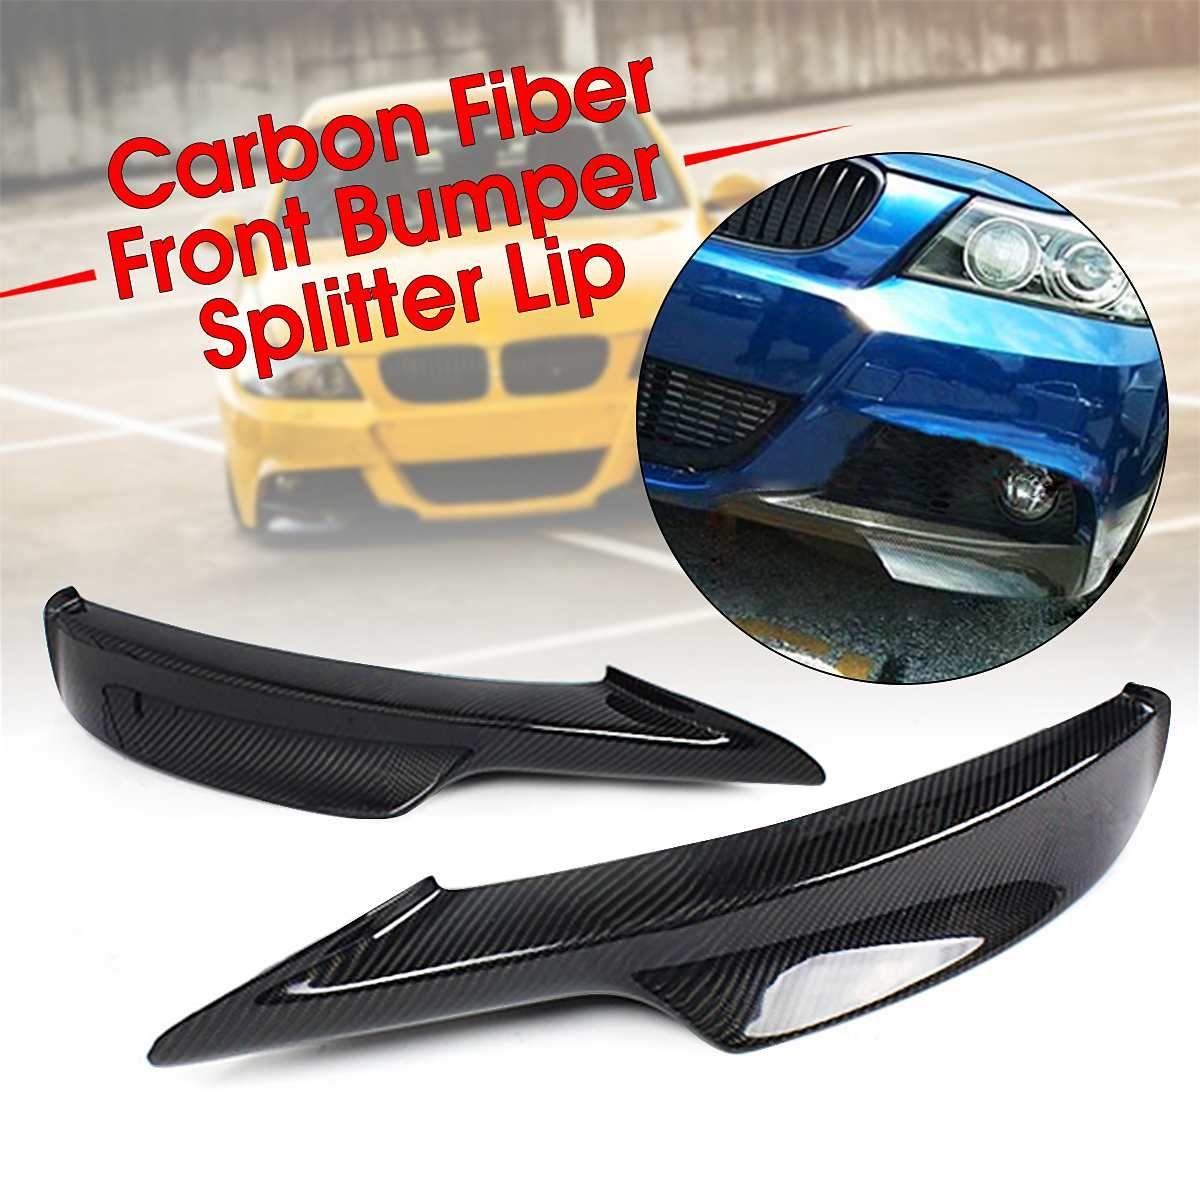 EIN Paar Real Carbon Fiber Car Front Stoßstange Splitter Lip Für BMW E90/E91 3 Serie 4 Dr Sedan mit M-Tech Stoßstange 2009-2011